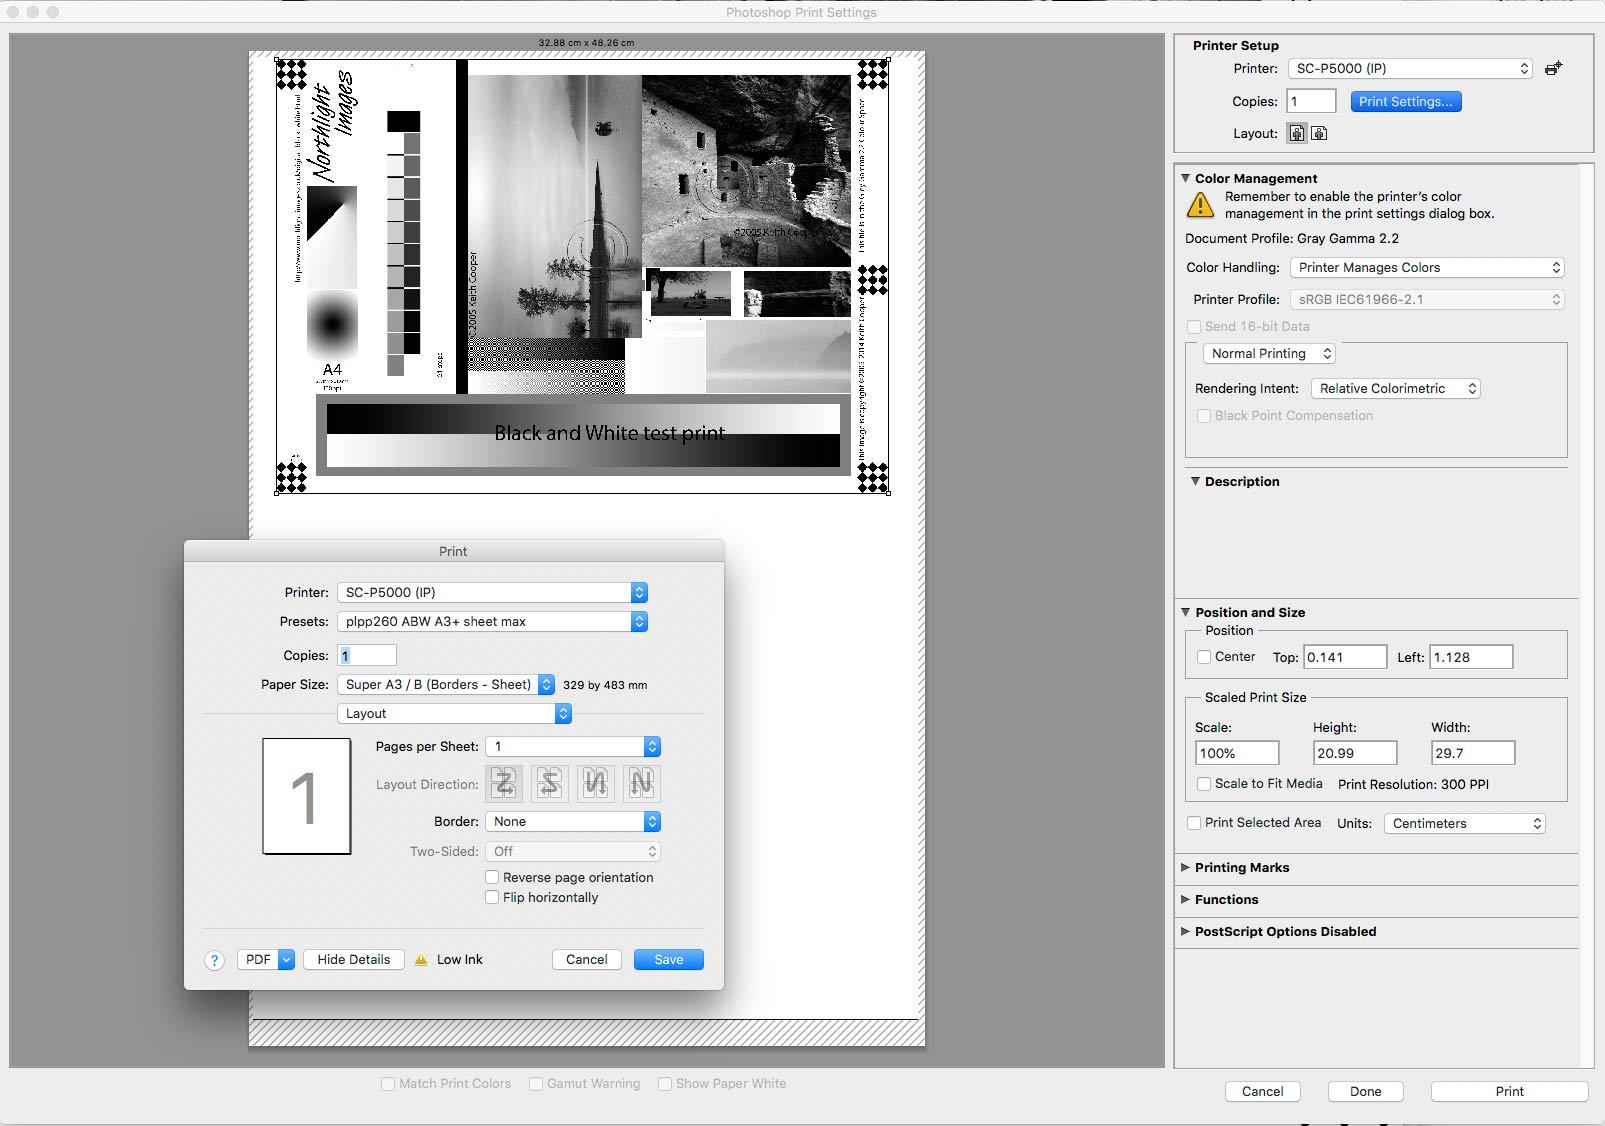 print-setup-paper